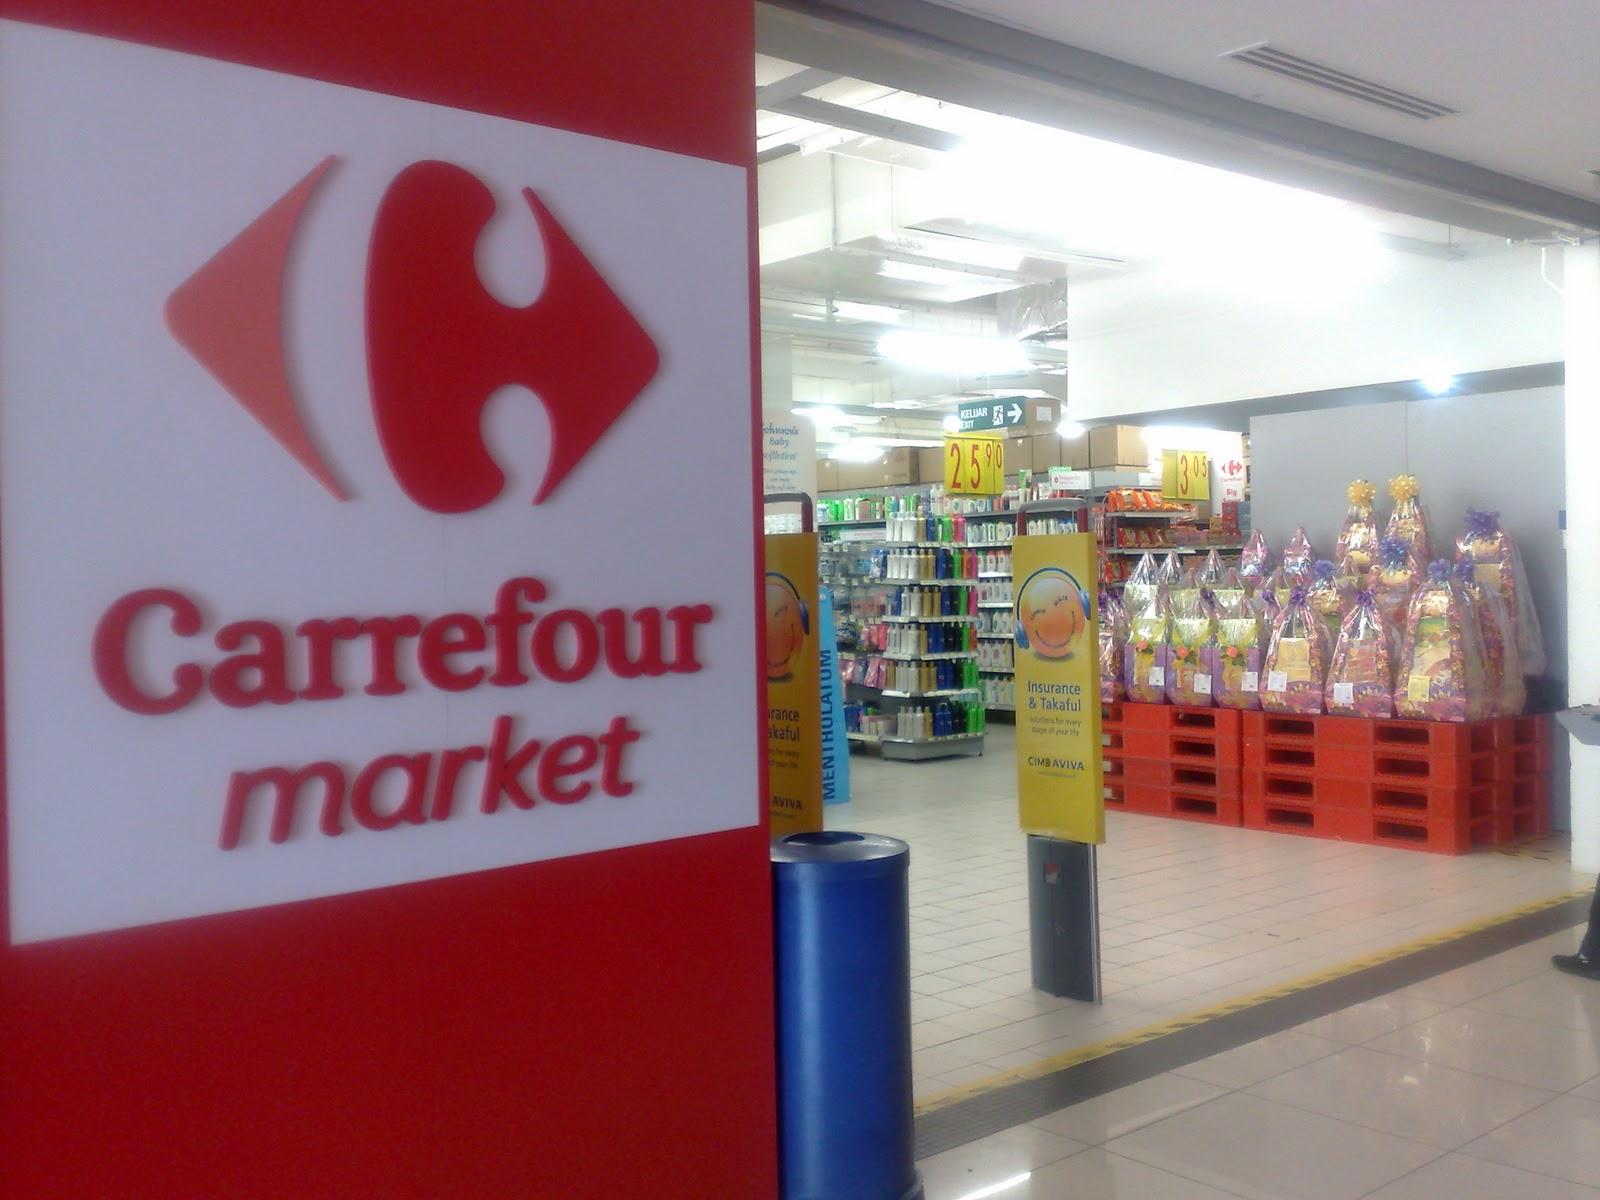 Melayu awek bp mall - 3 part 6